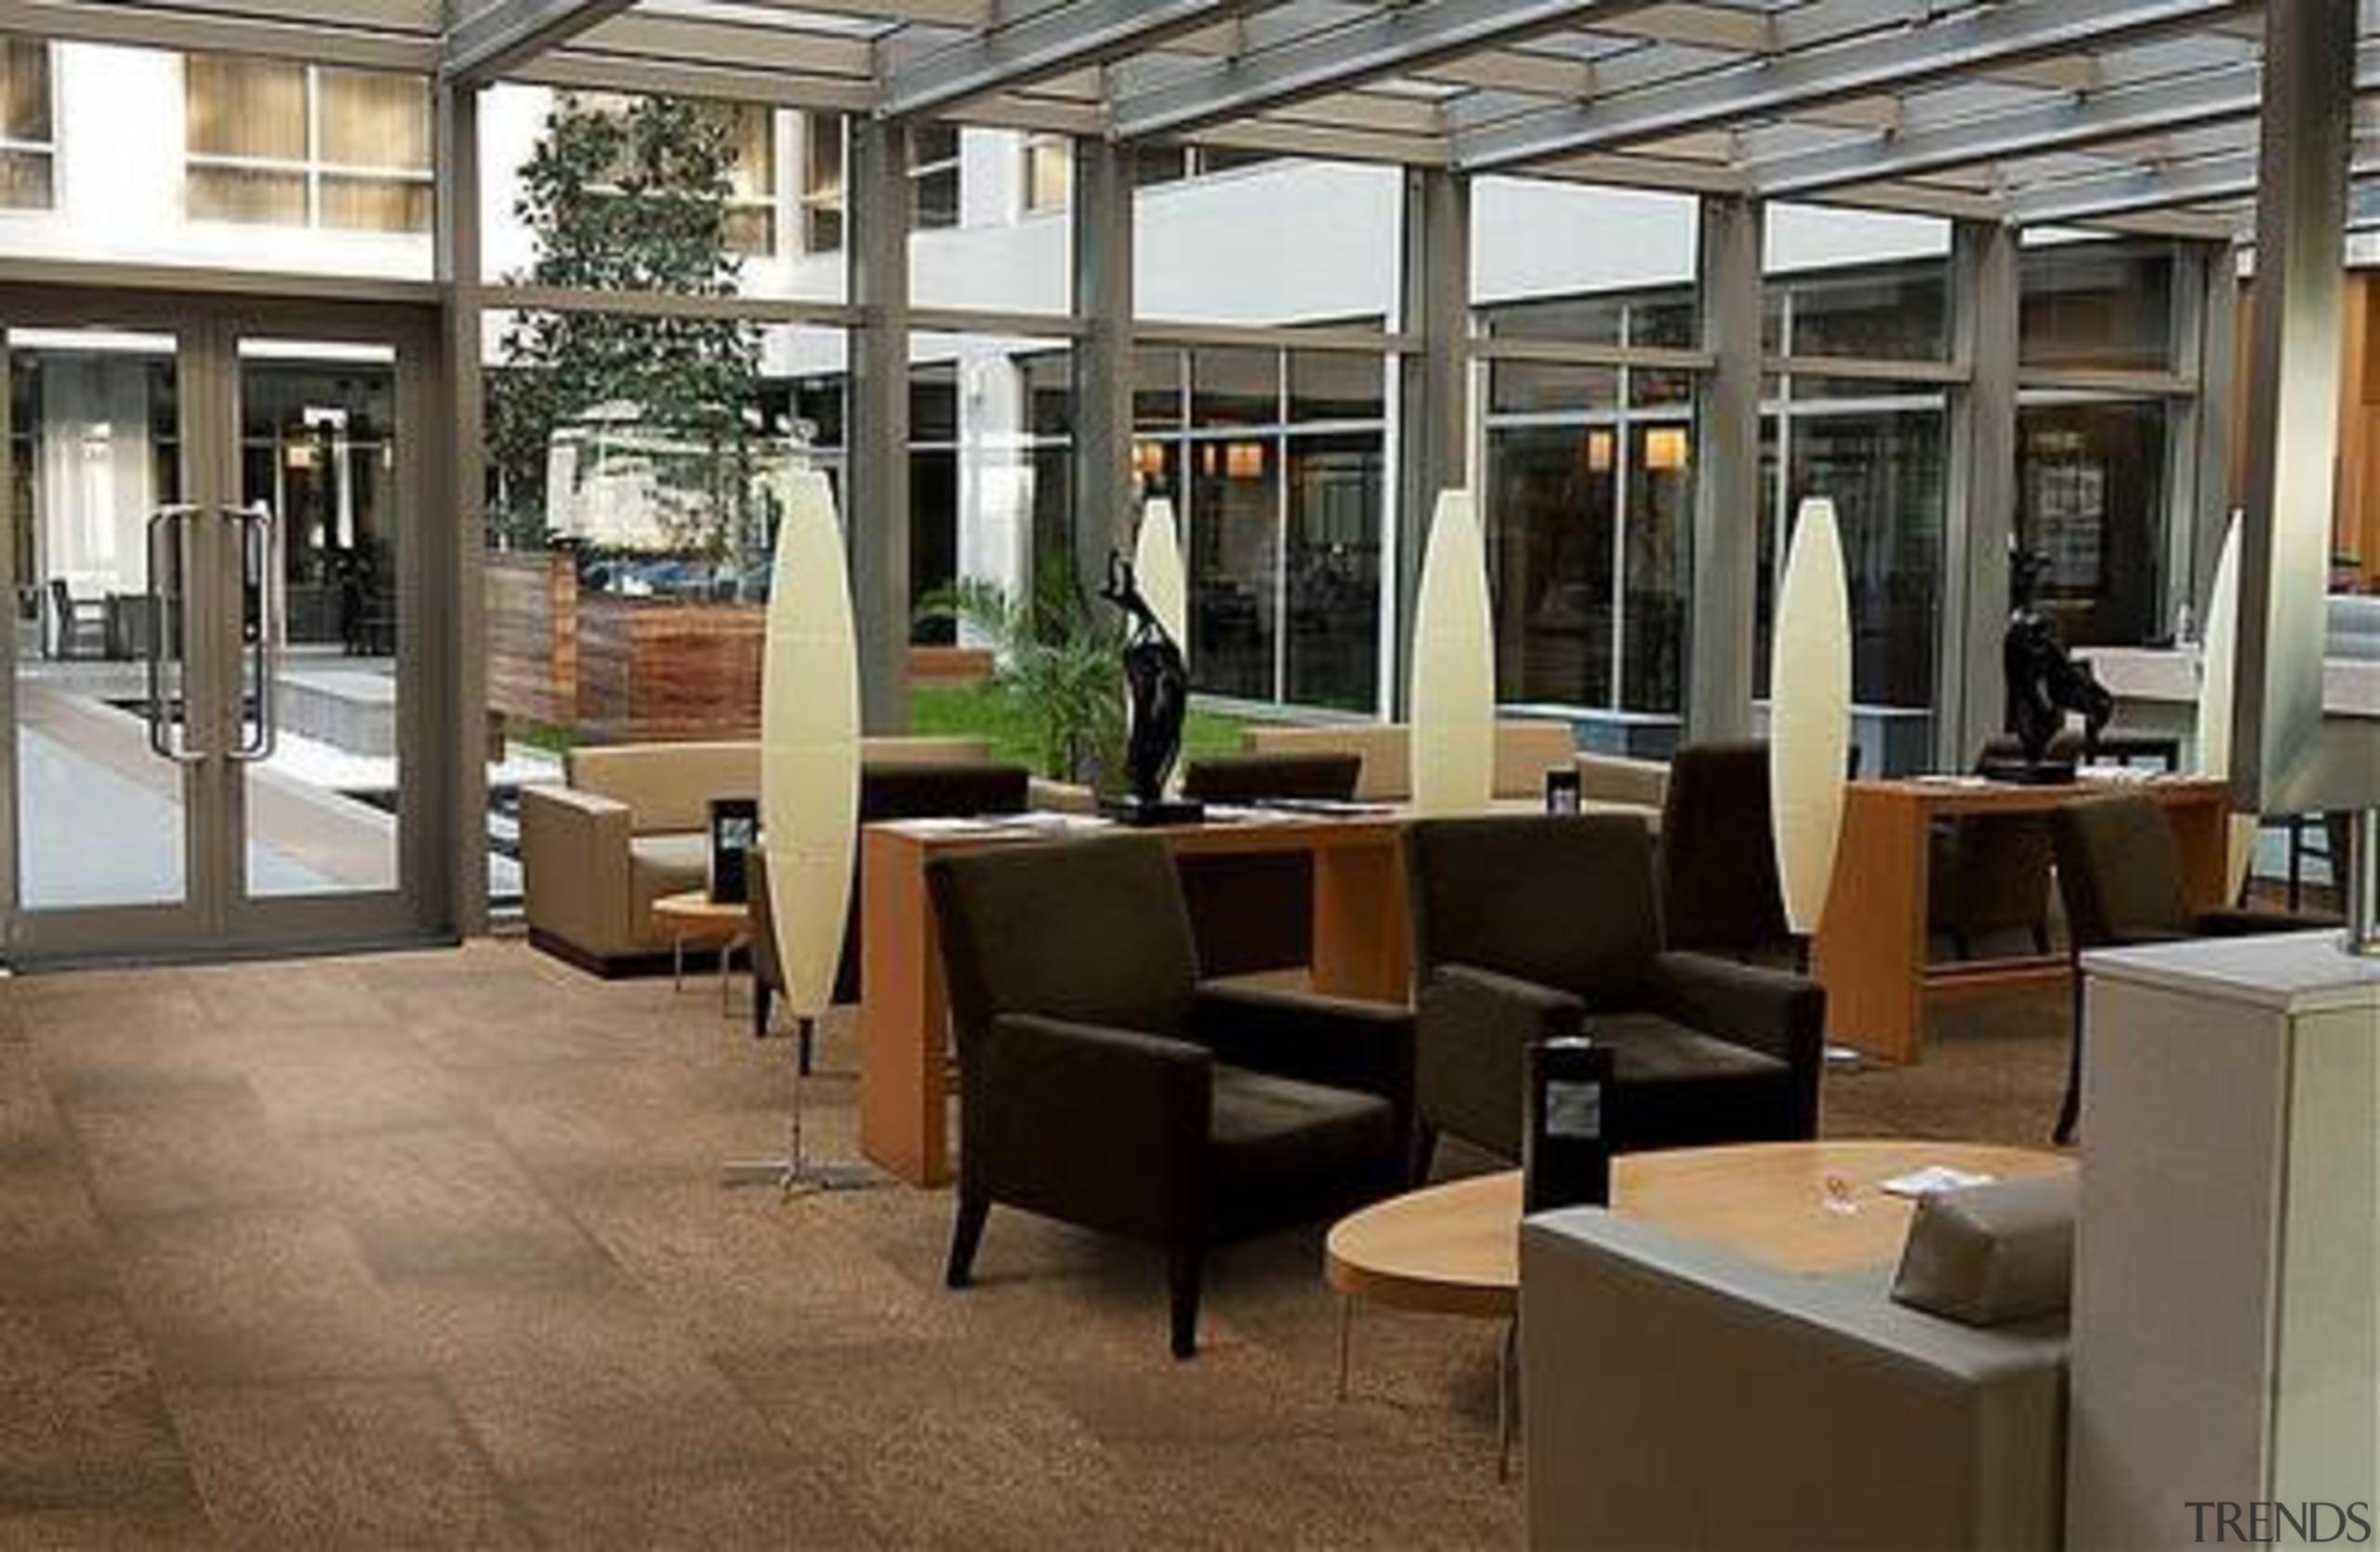 Cork Comfort - Slate Moccaccino - Cork Comfort furniture, interior design, lobby, black, brown